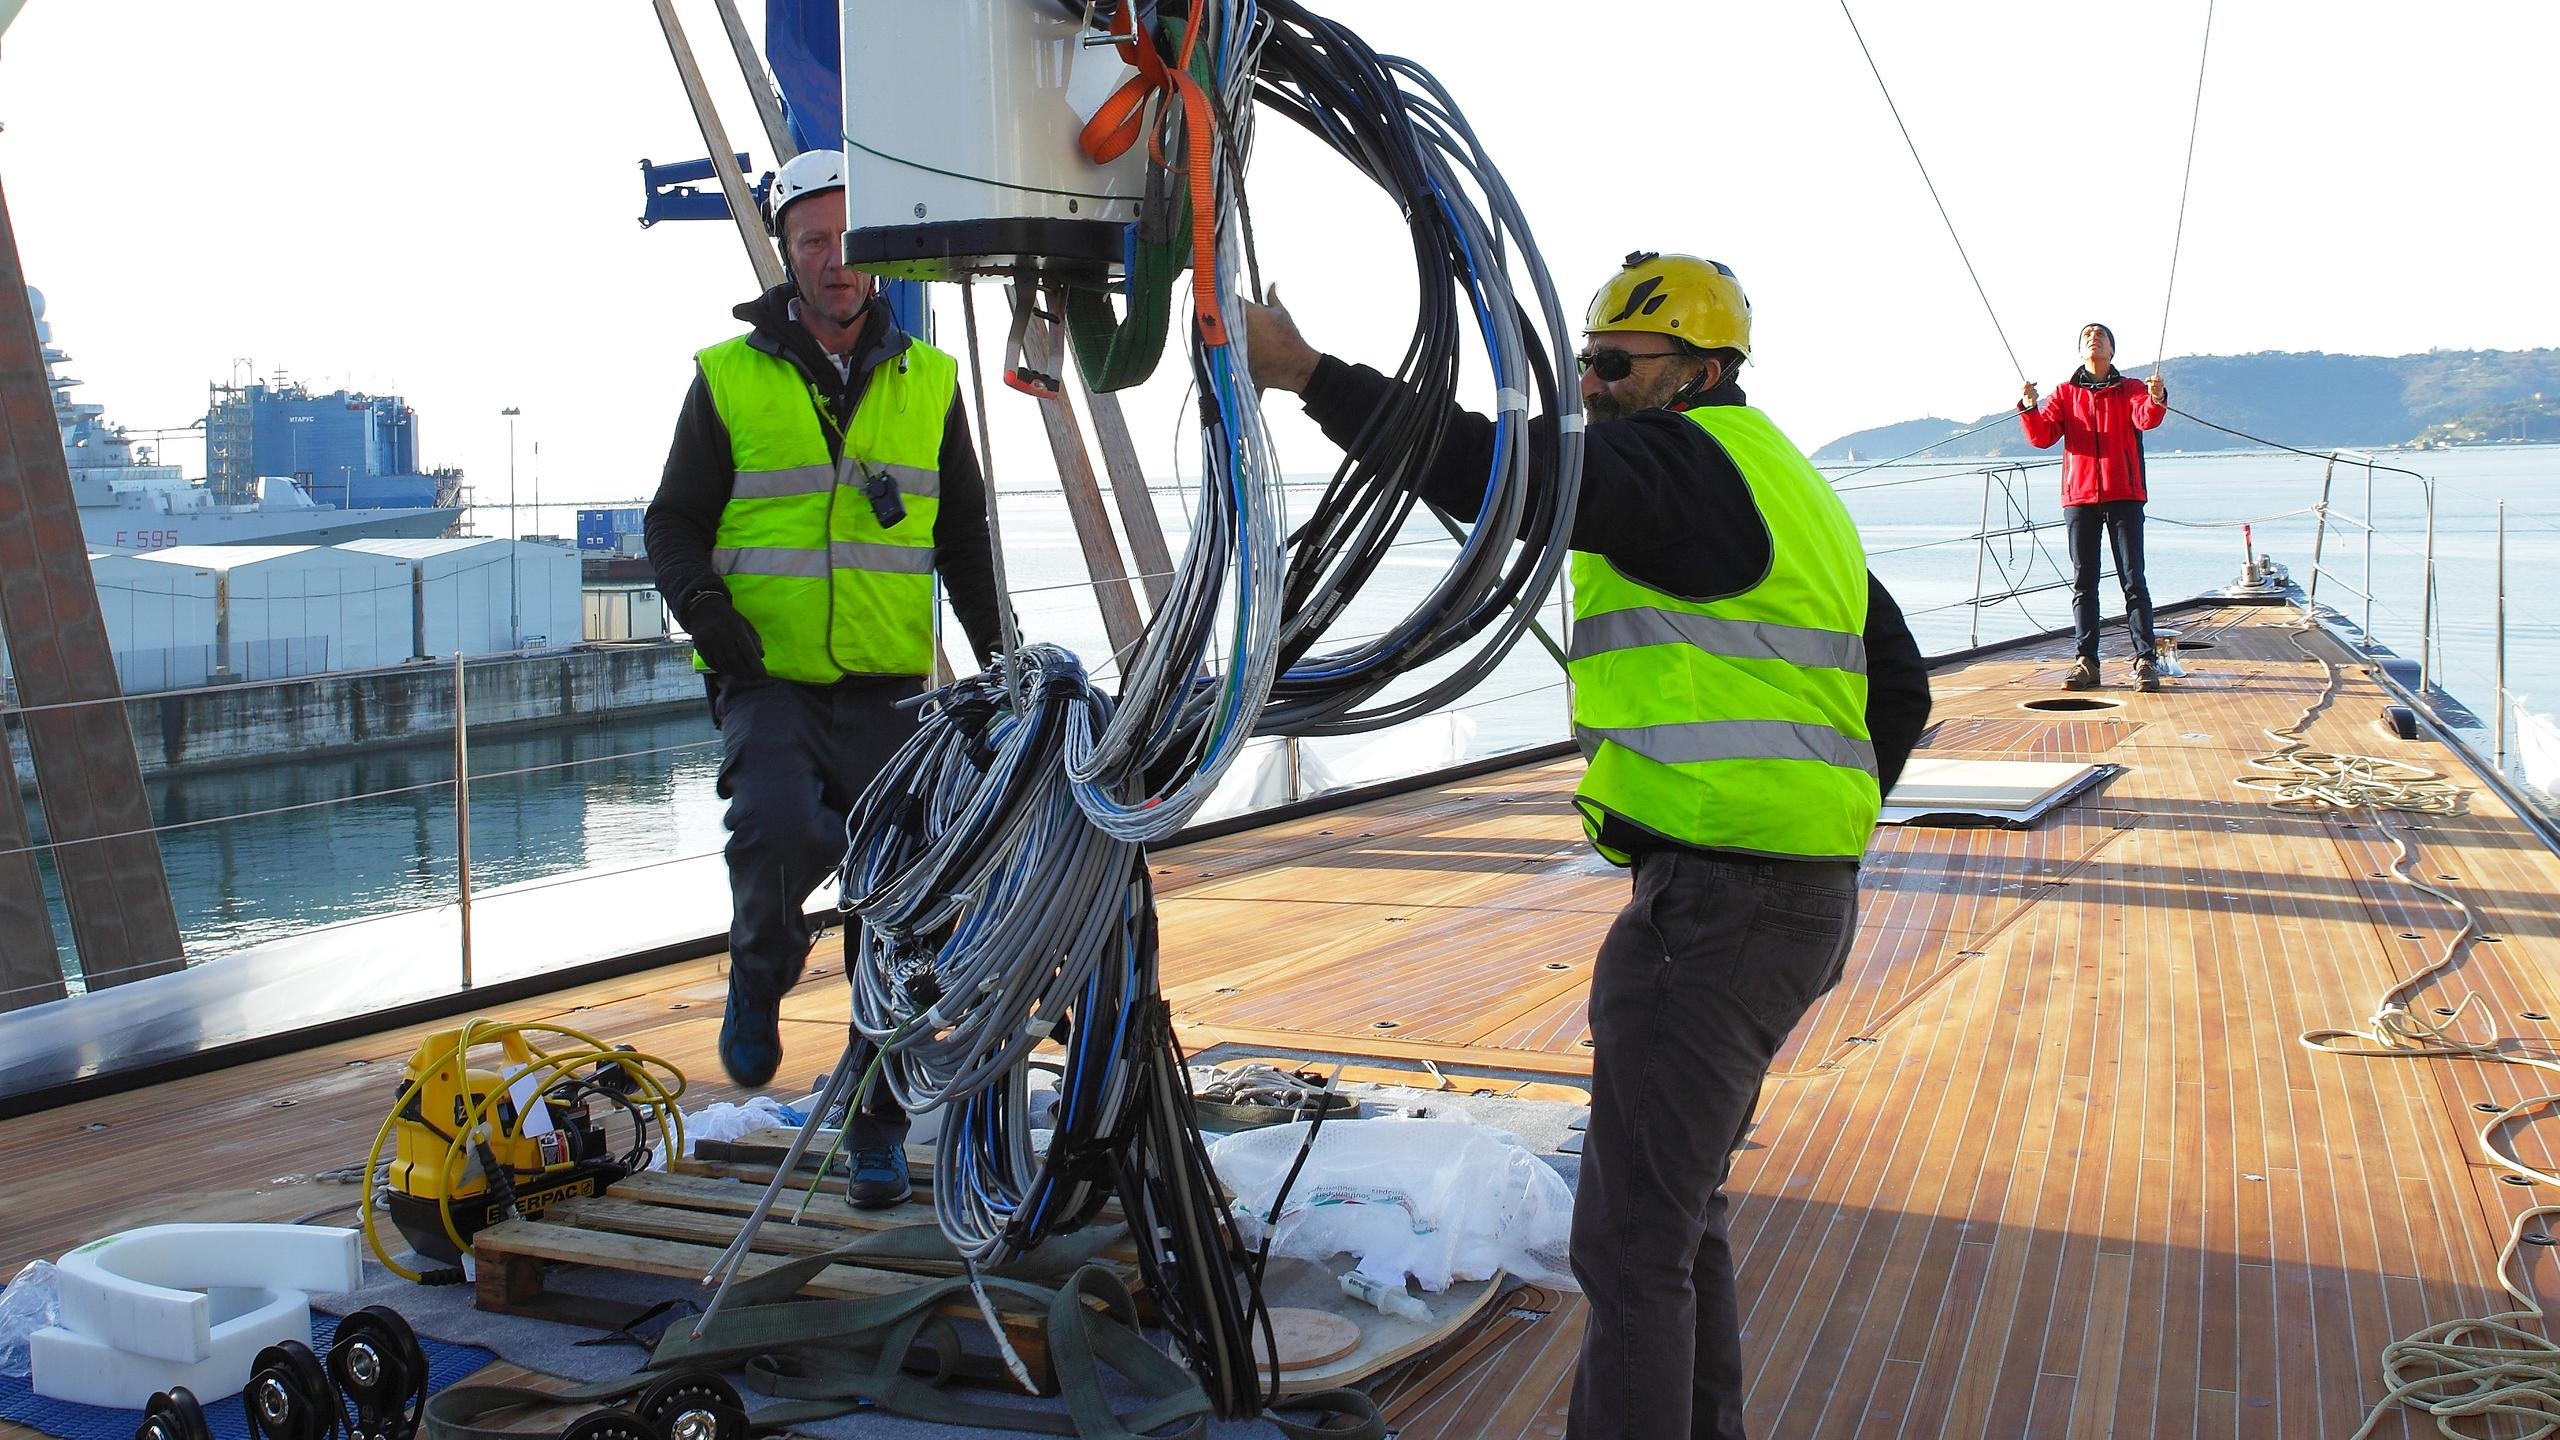 dahlak-sailing-yacht-perini-navi-2016-38m-mast